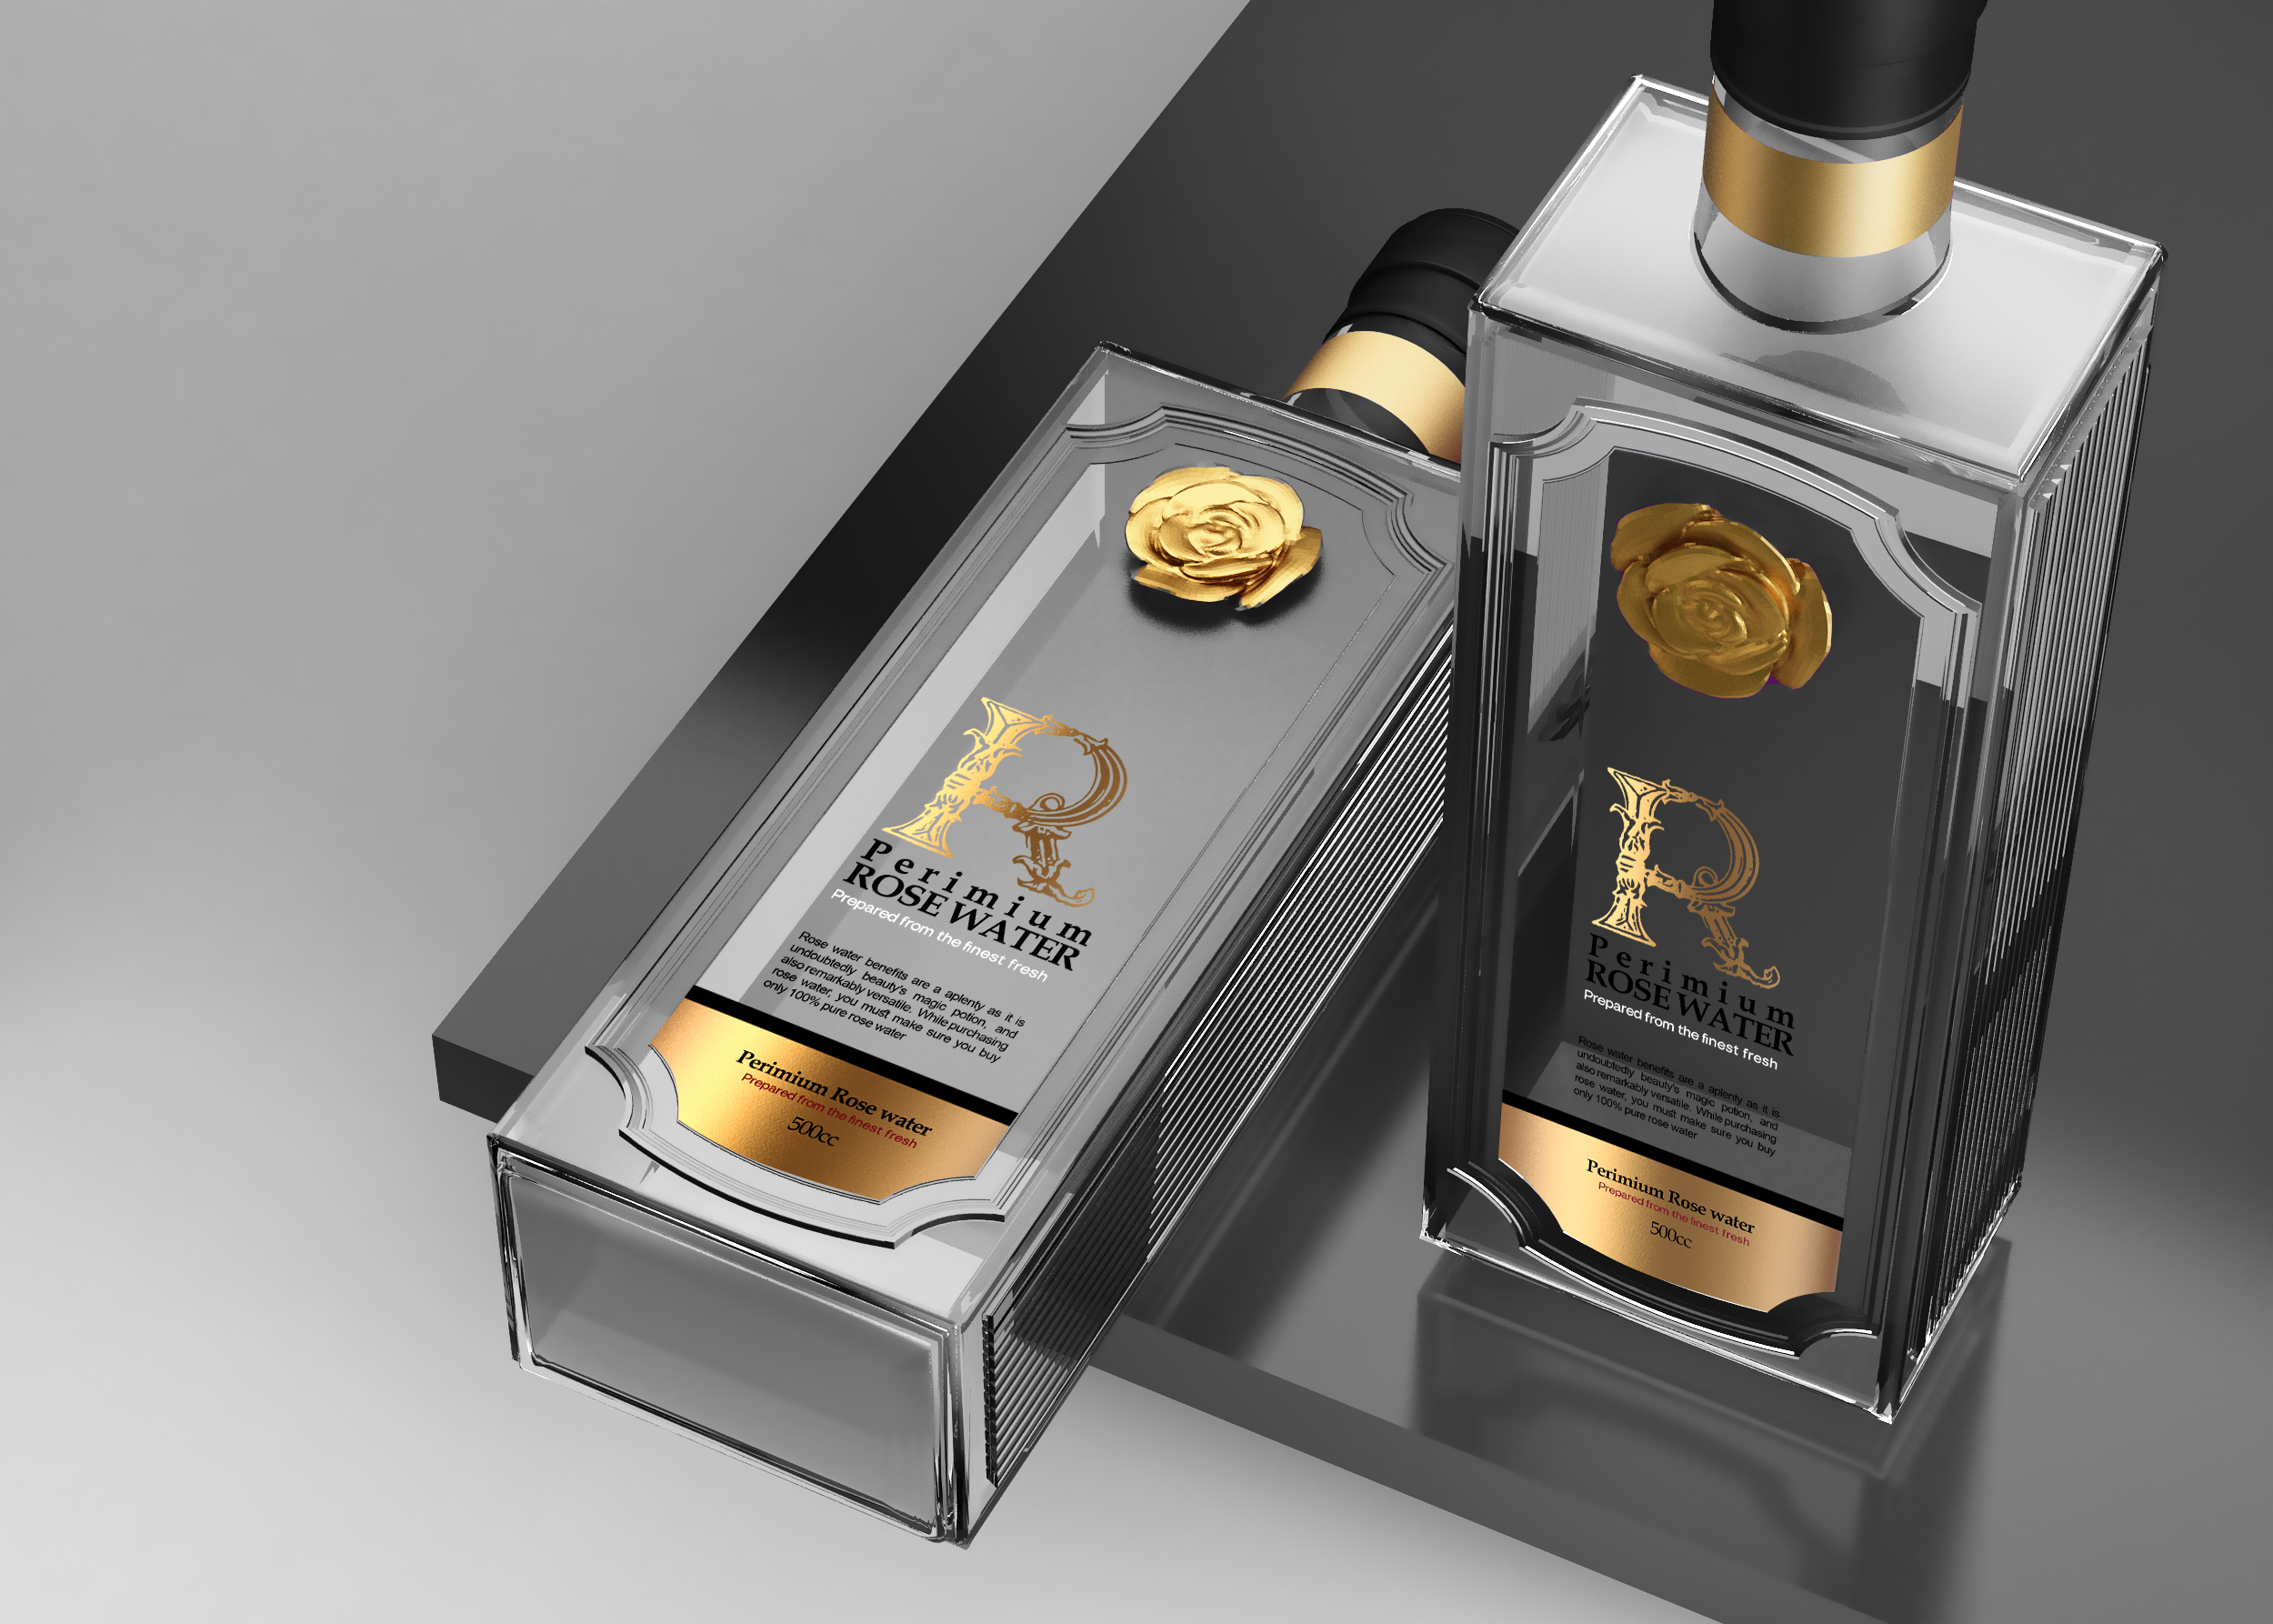 Rosewater Bottle Design